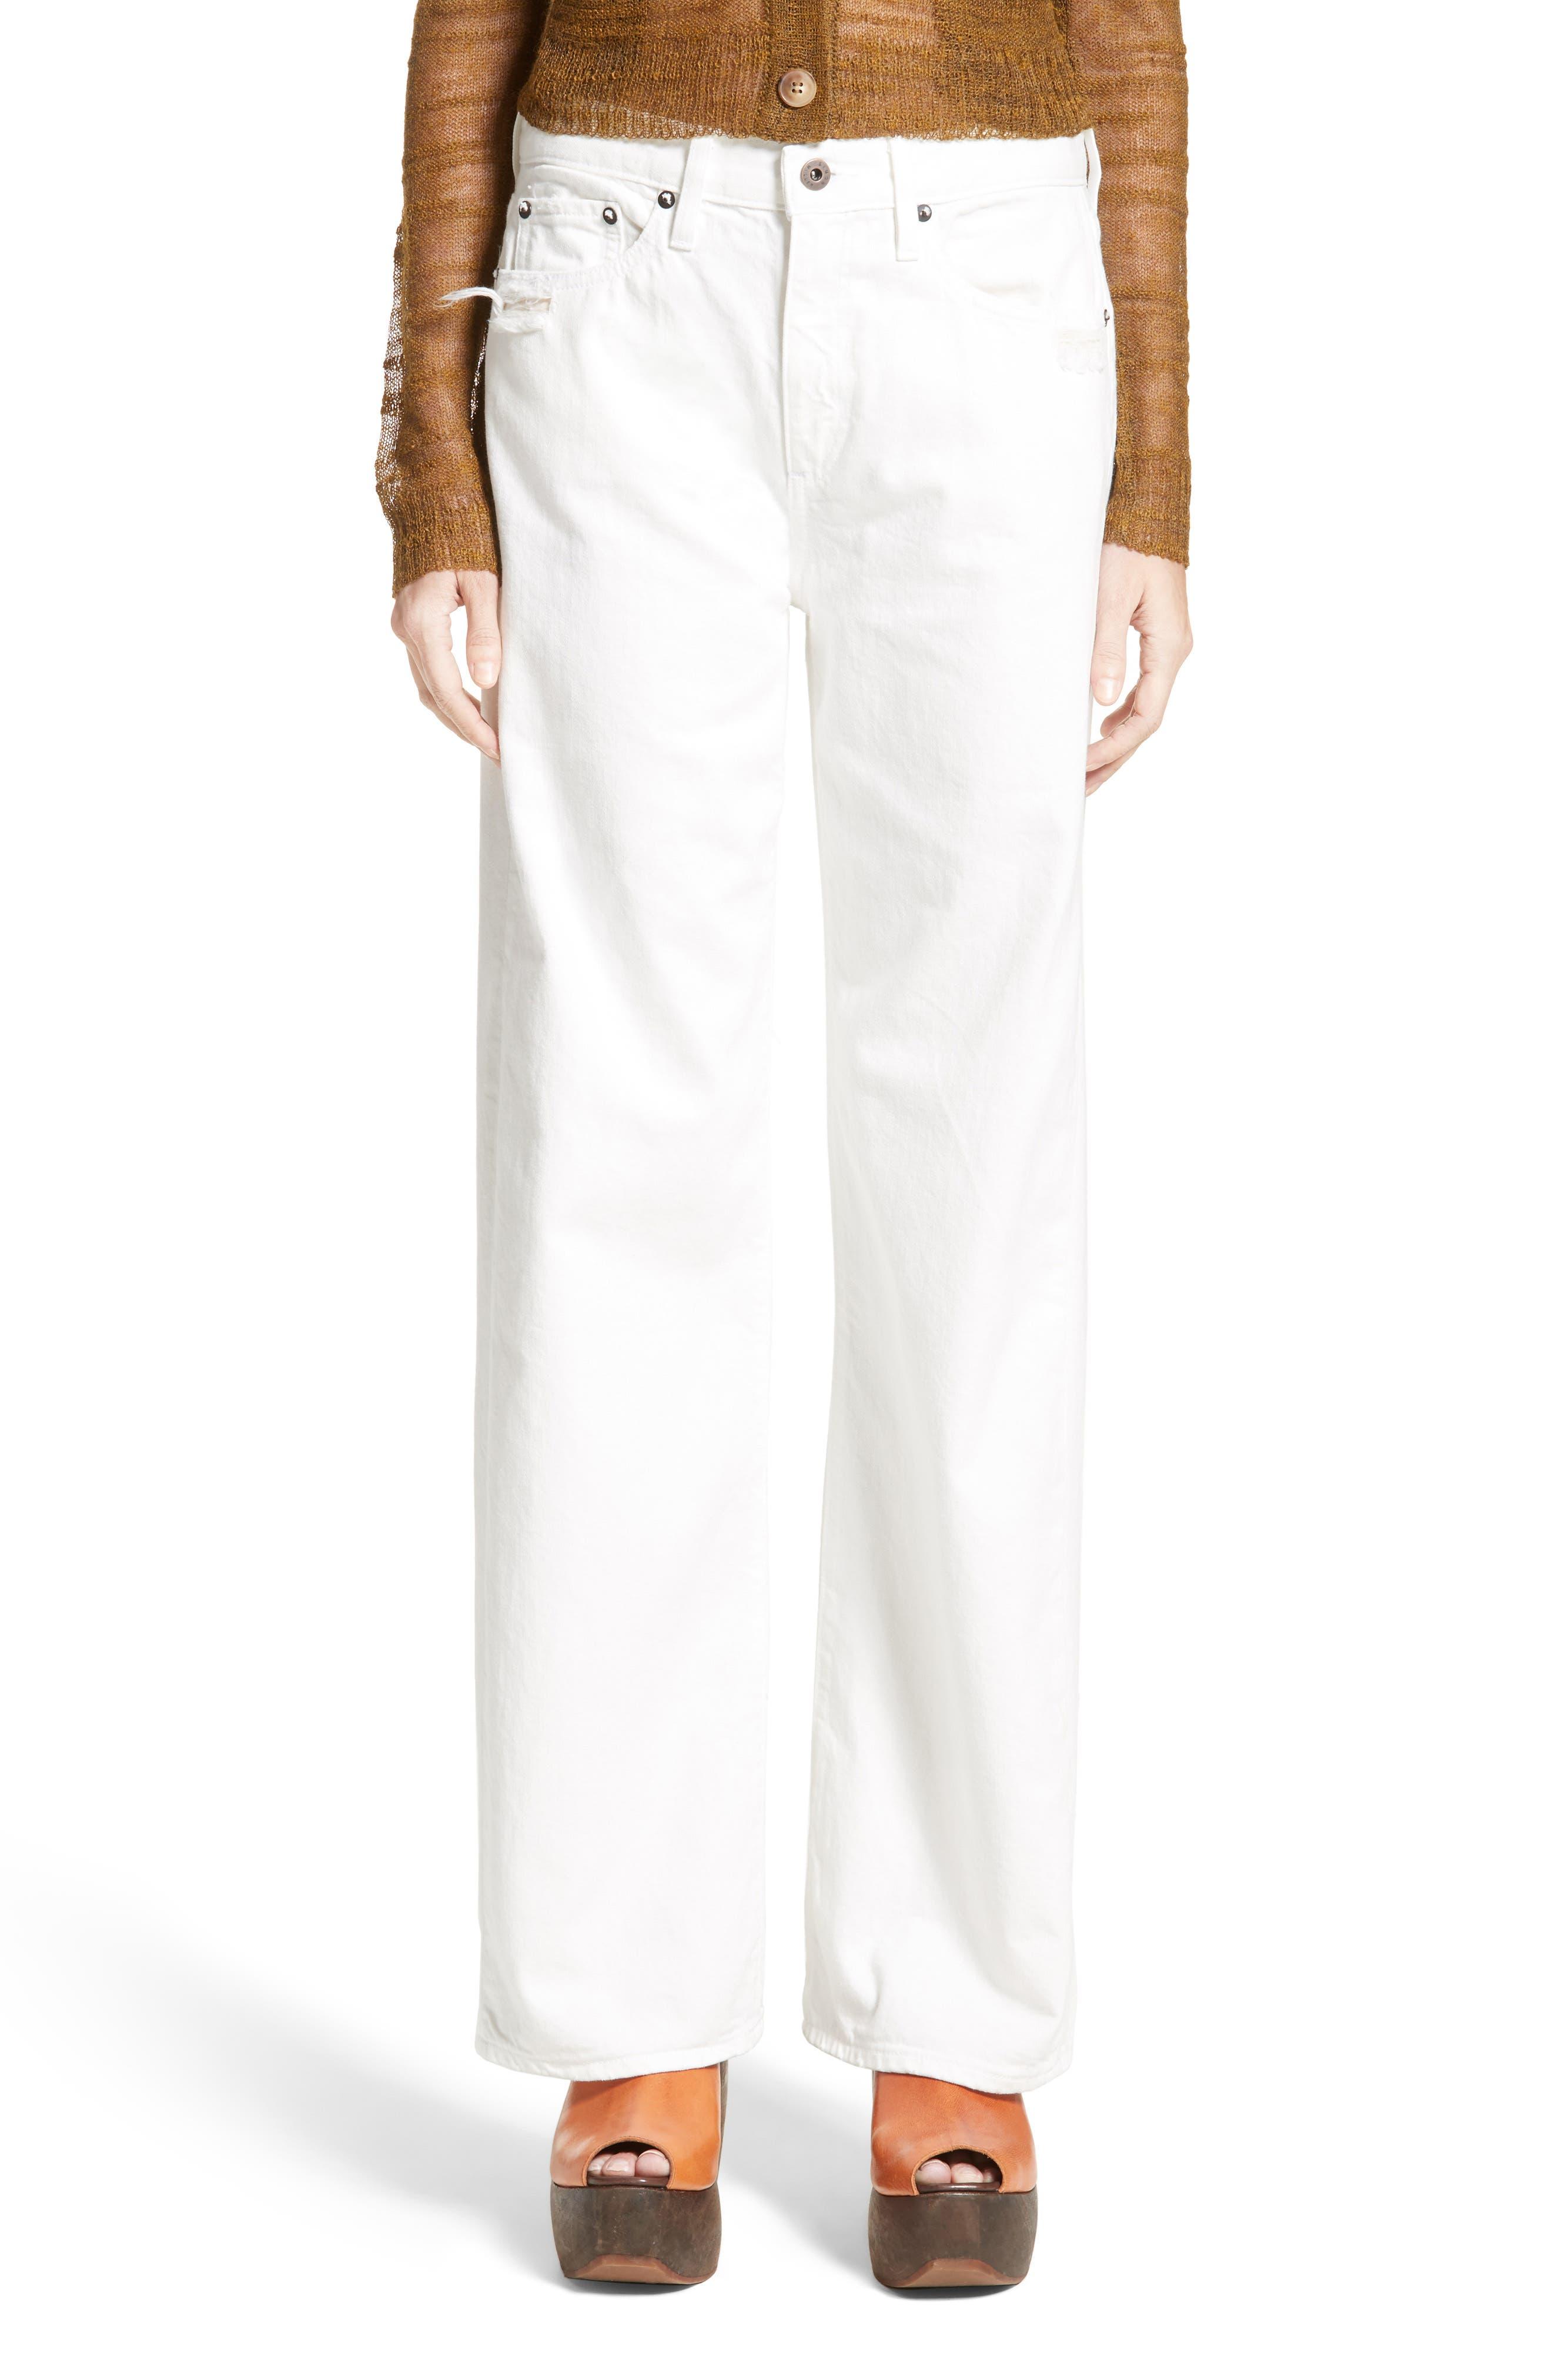 Latta Ankle Jeans,                             Main thumbnail 1, color,                             100